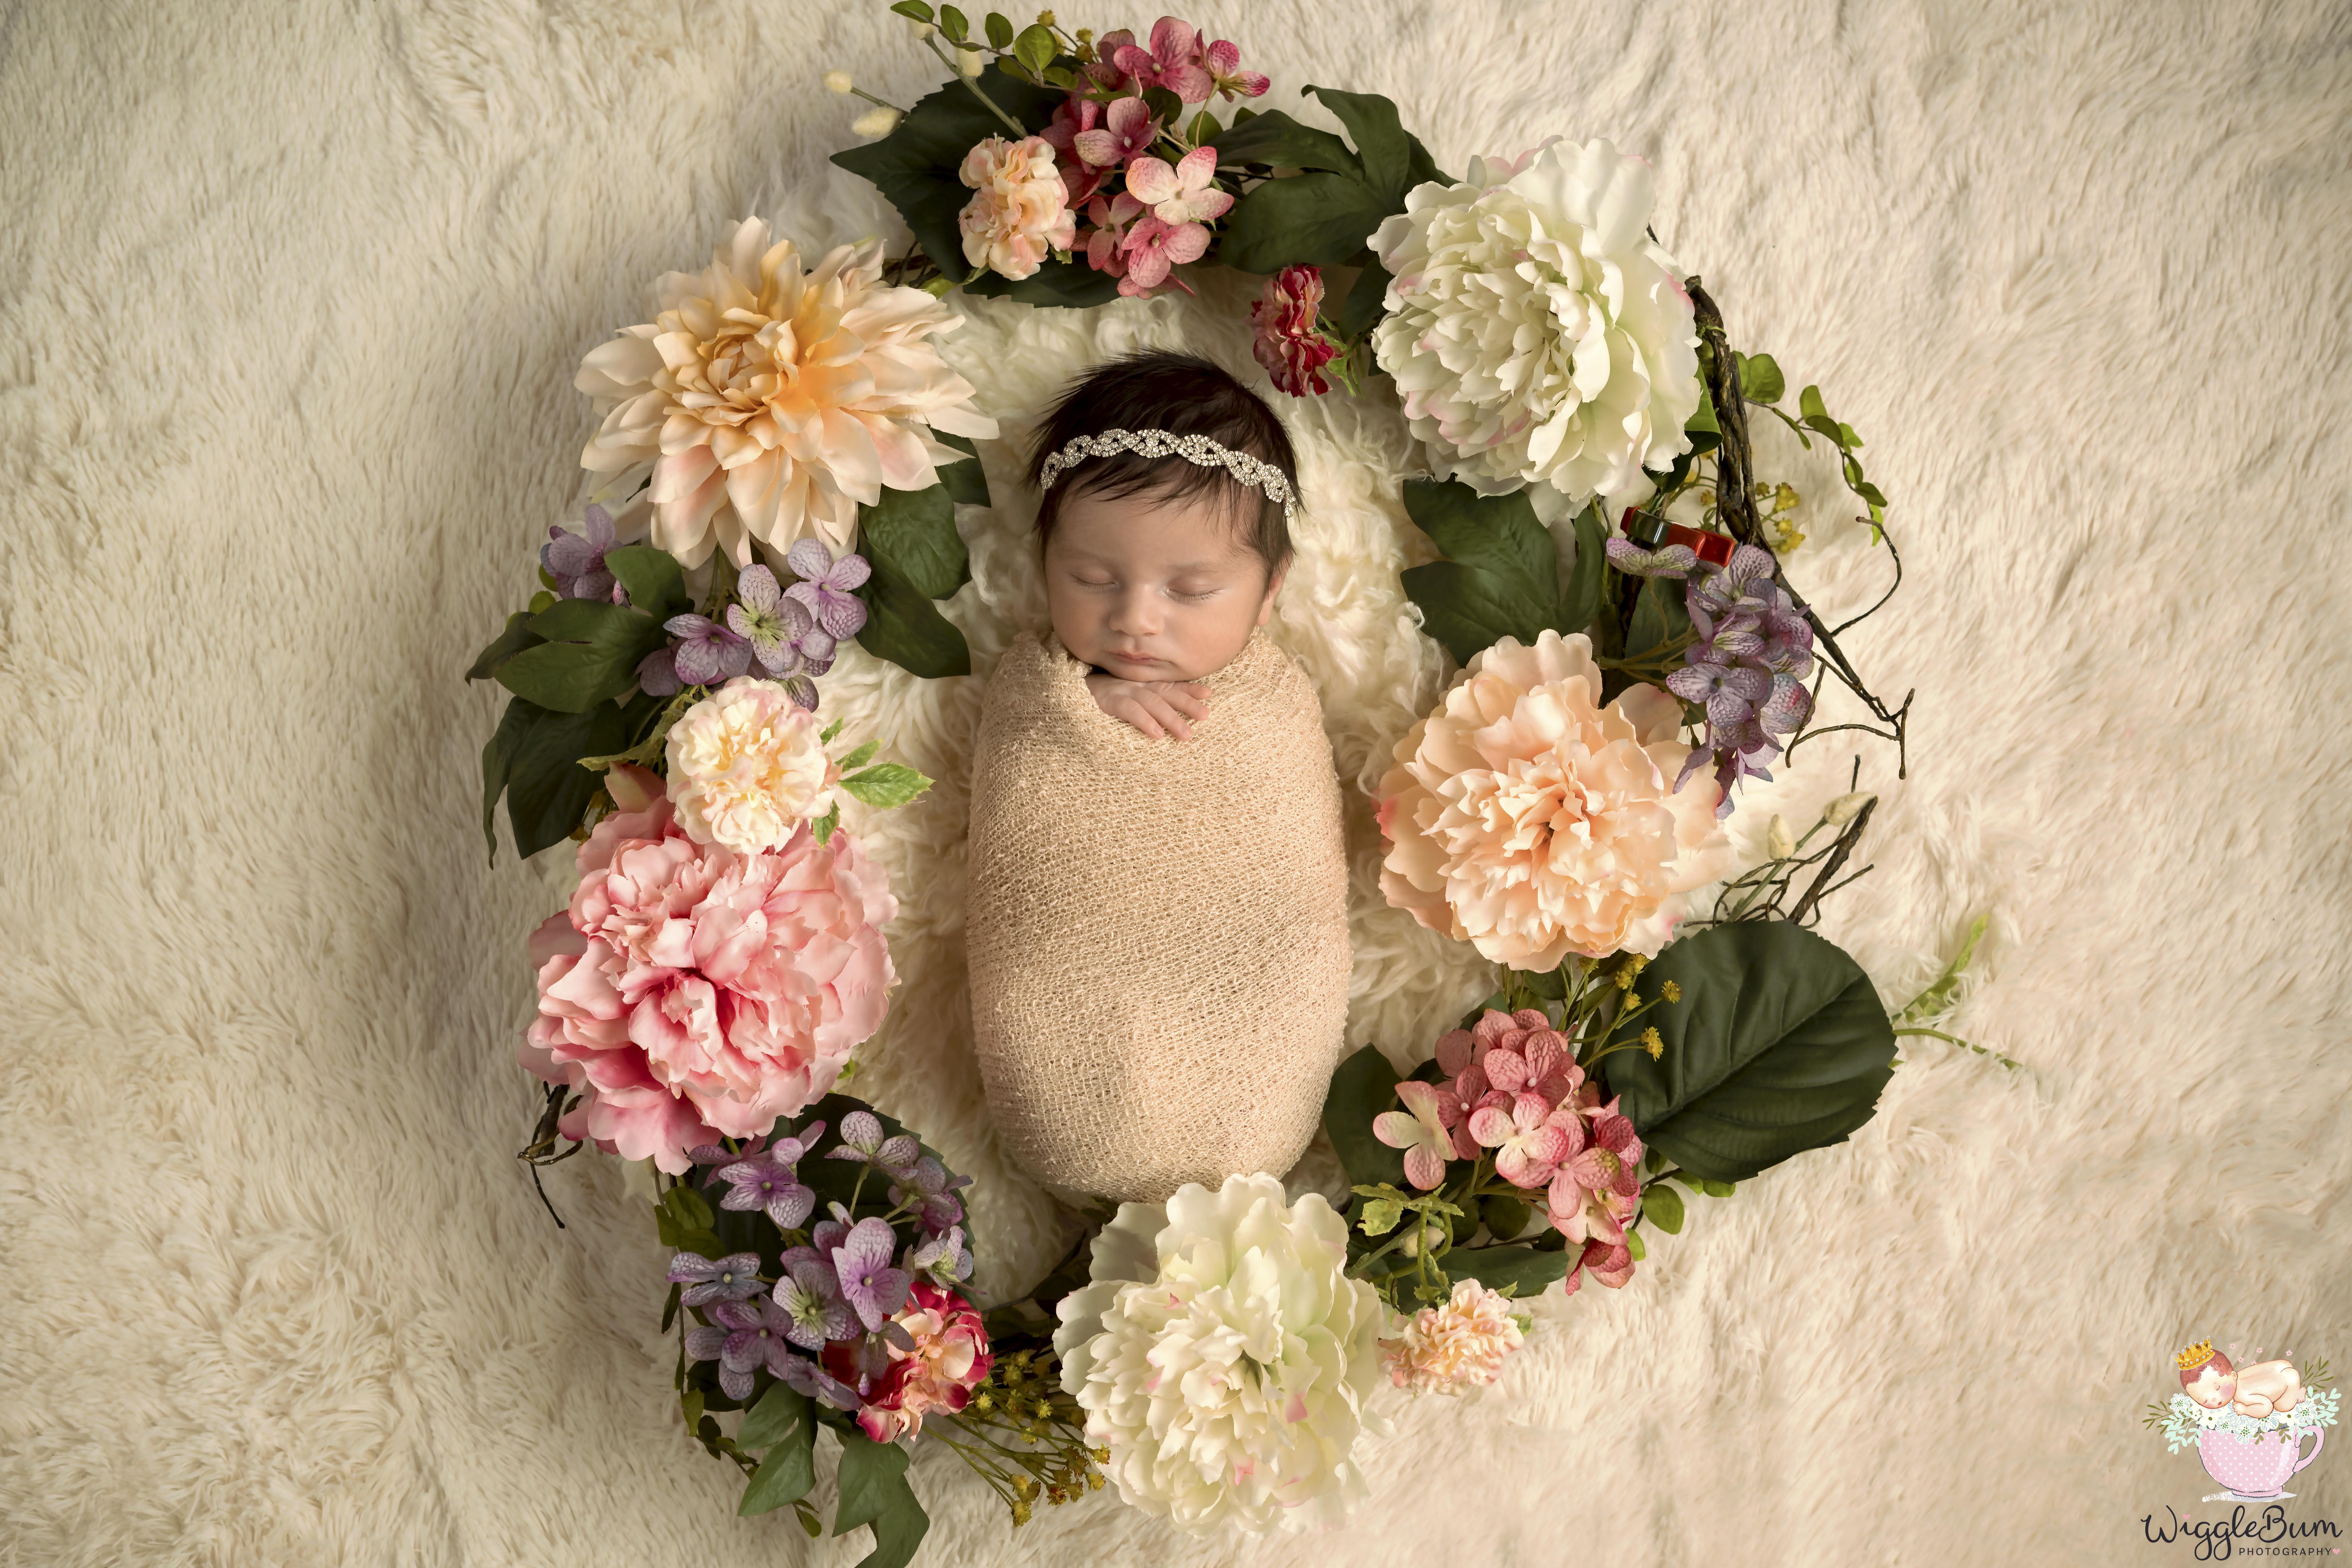 Wigglebum-infant-photography-newborn-India-Mumbai-best-top-flowers